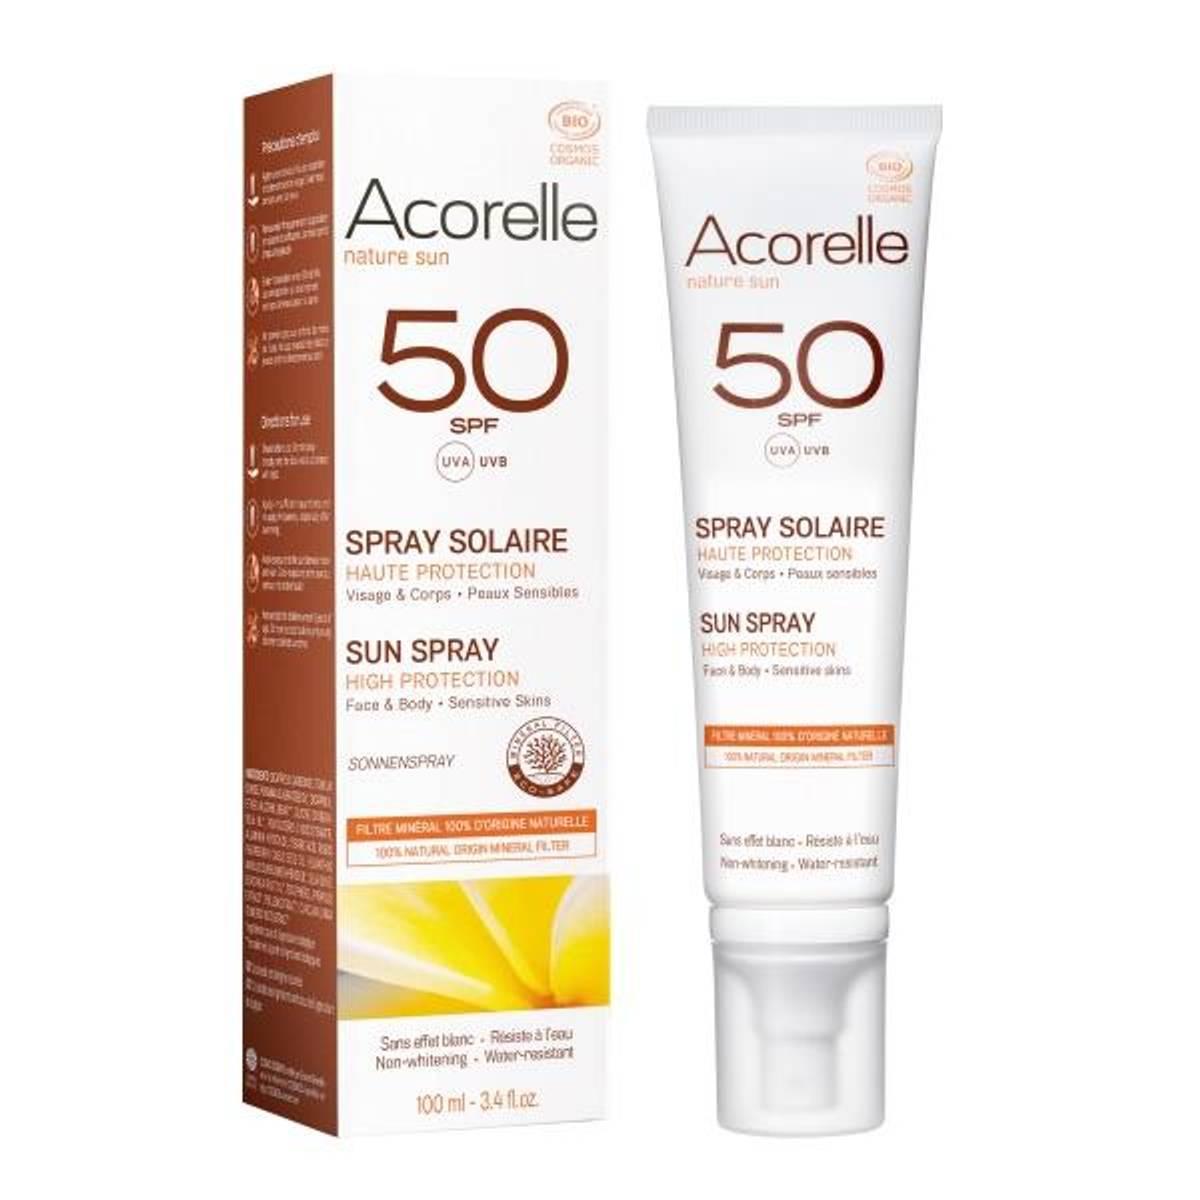 Acorelle Sun Spray SPF 50 - 100ml